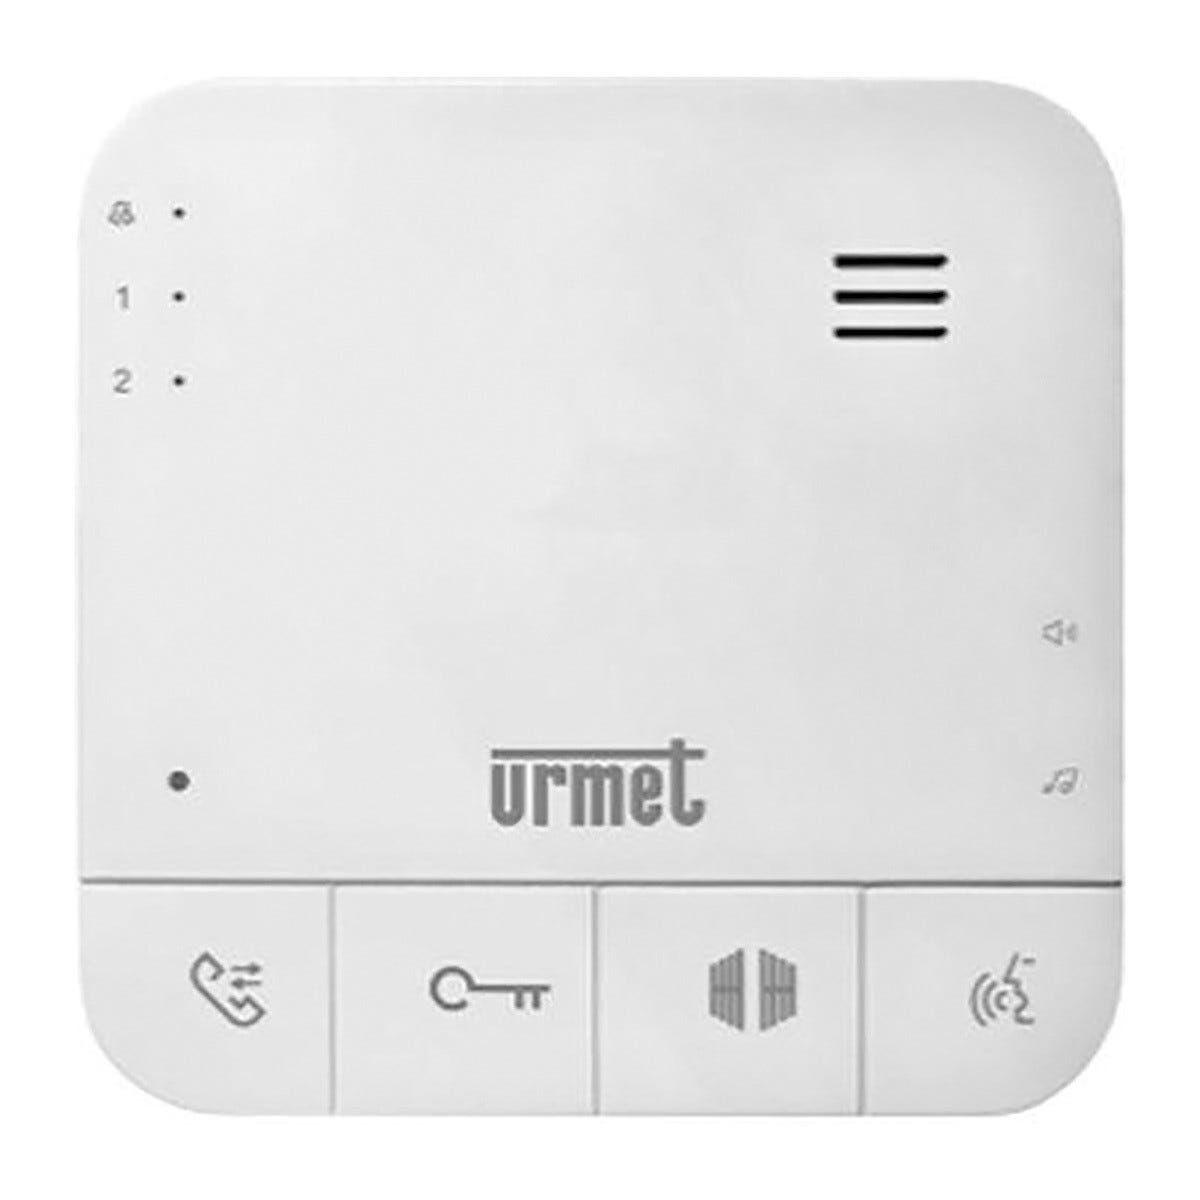 URMET Citofono  Soft Touch Viva-Voce Intercomunicante Per Kit 1726/11 E 1726/12